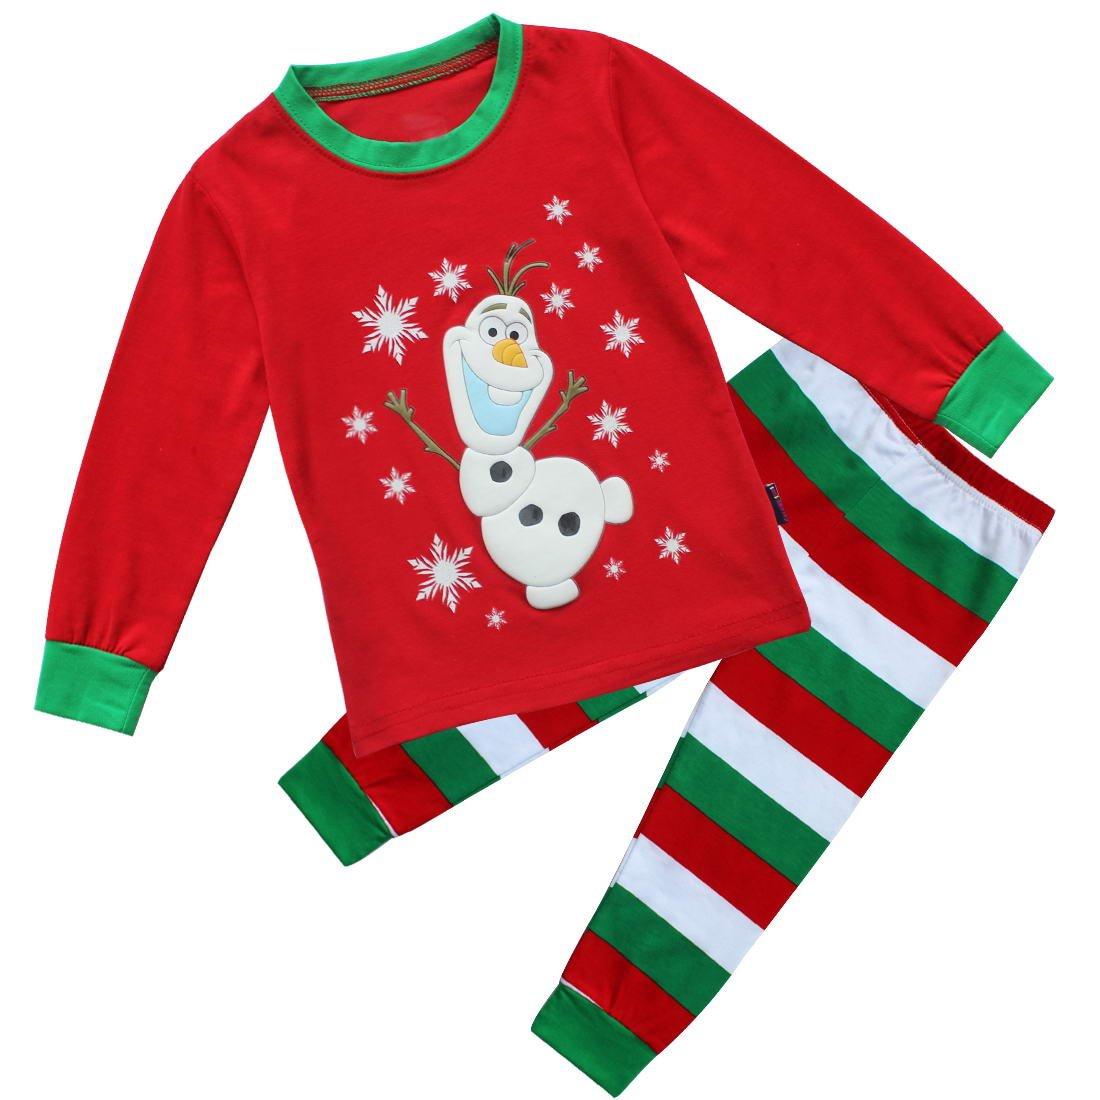 Wonful Little Kids Cute Cartoon Stitching Cotton Top Pant Sets (Set of 2 Pieces) 1-6Y